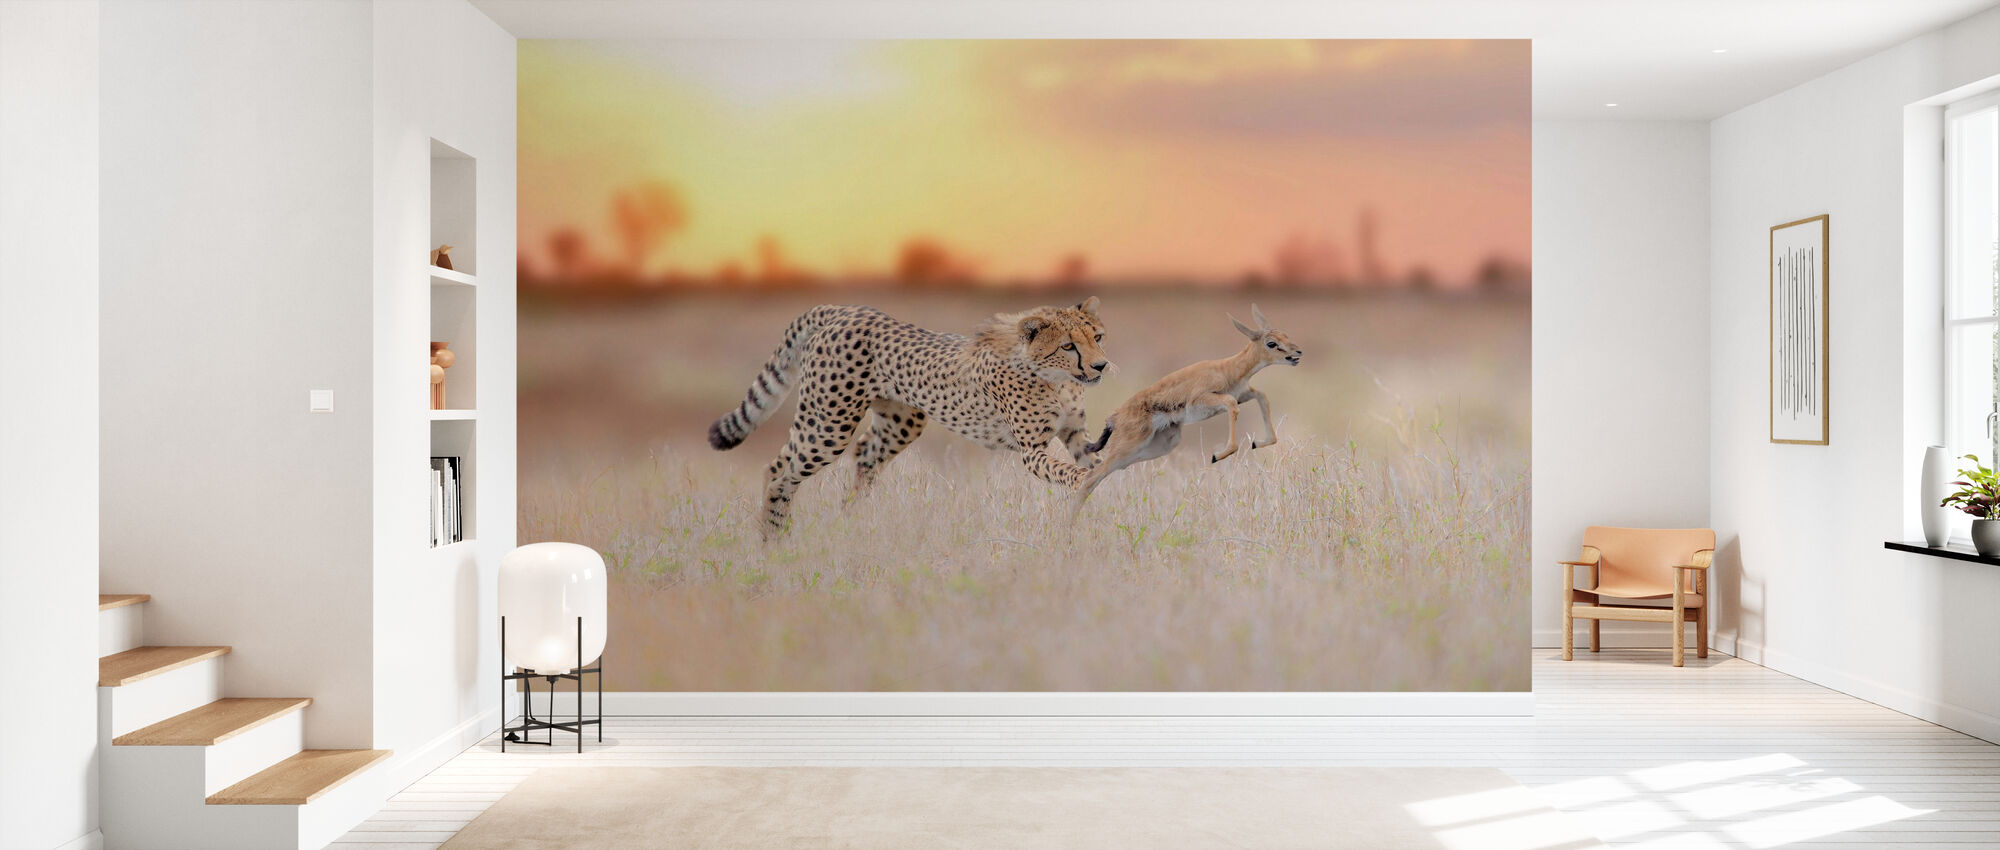 Cheetah Hunting a Gazelle - Wallpaper - Hallway